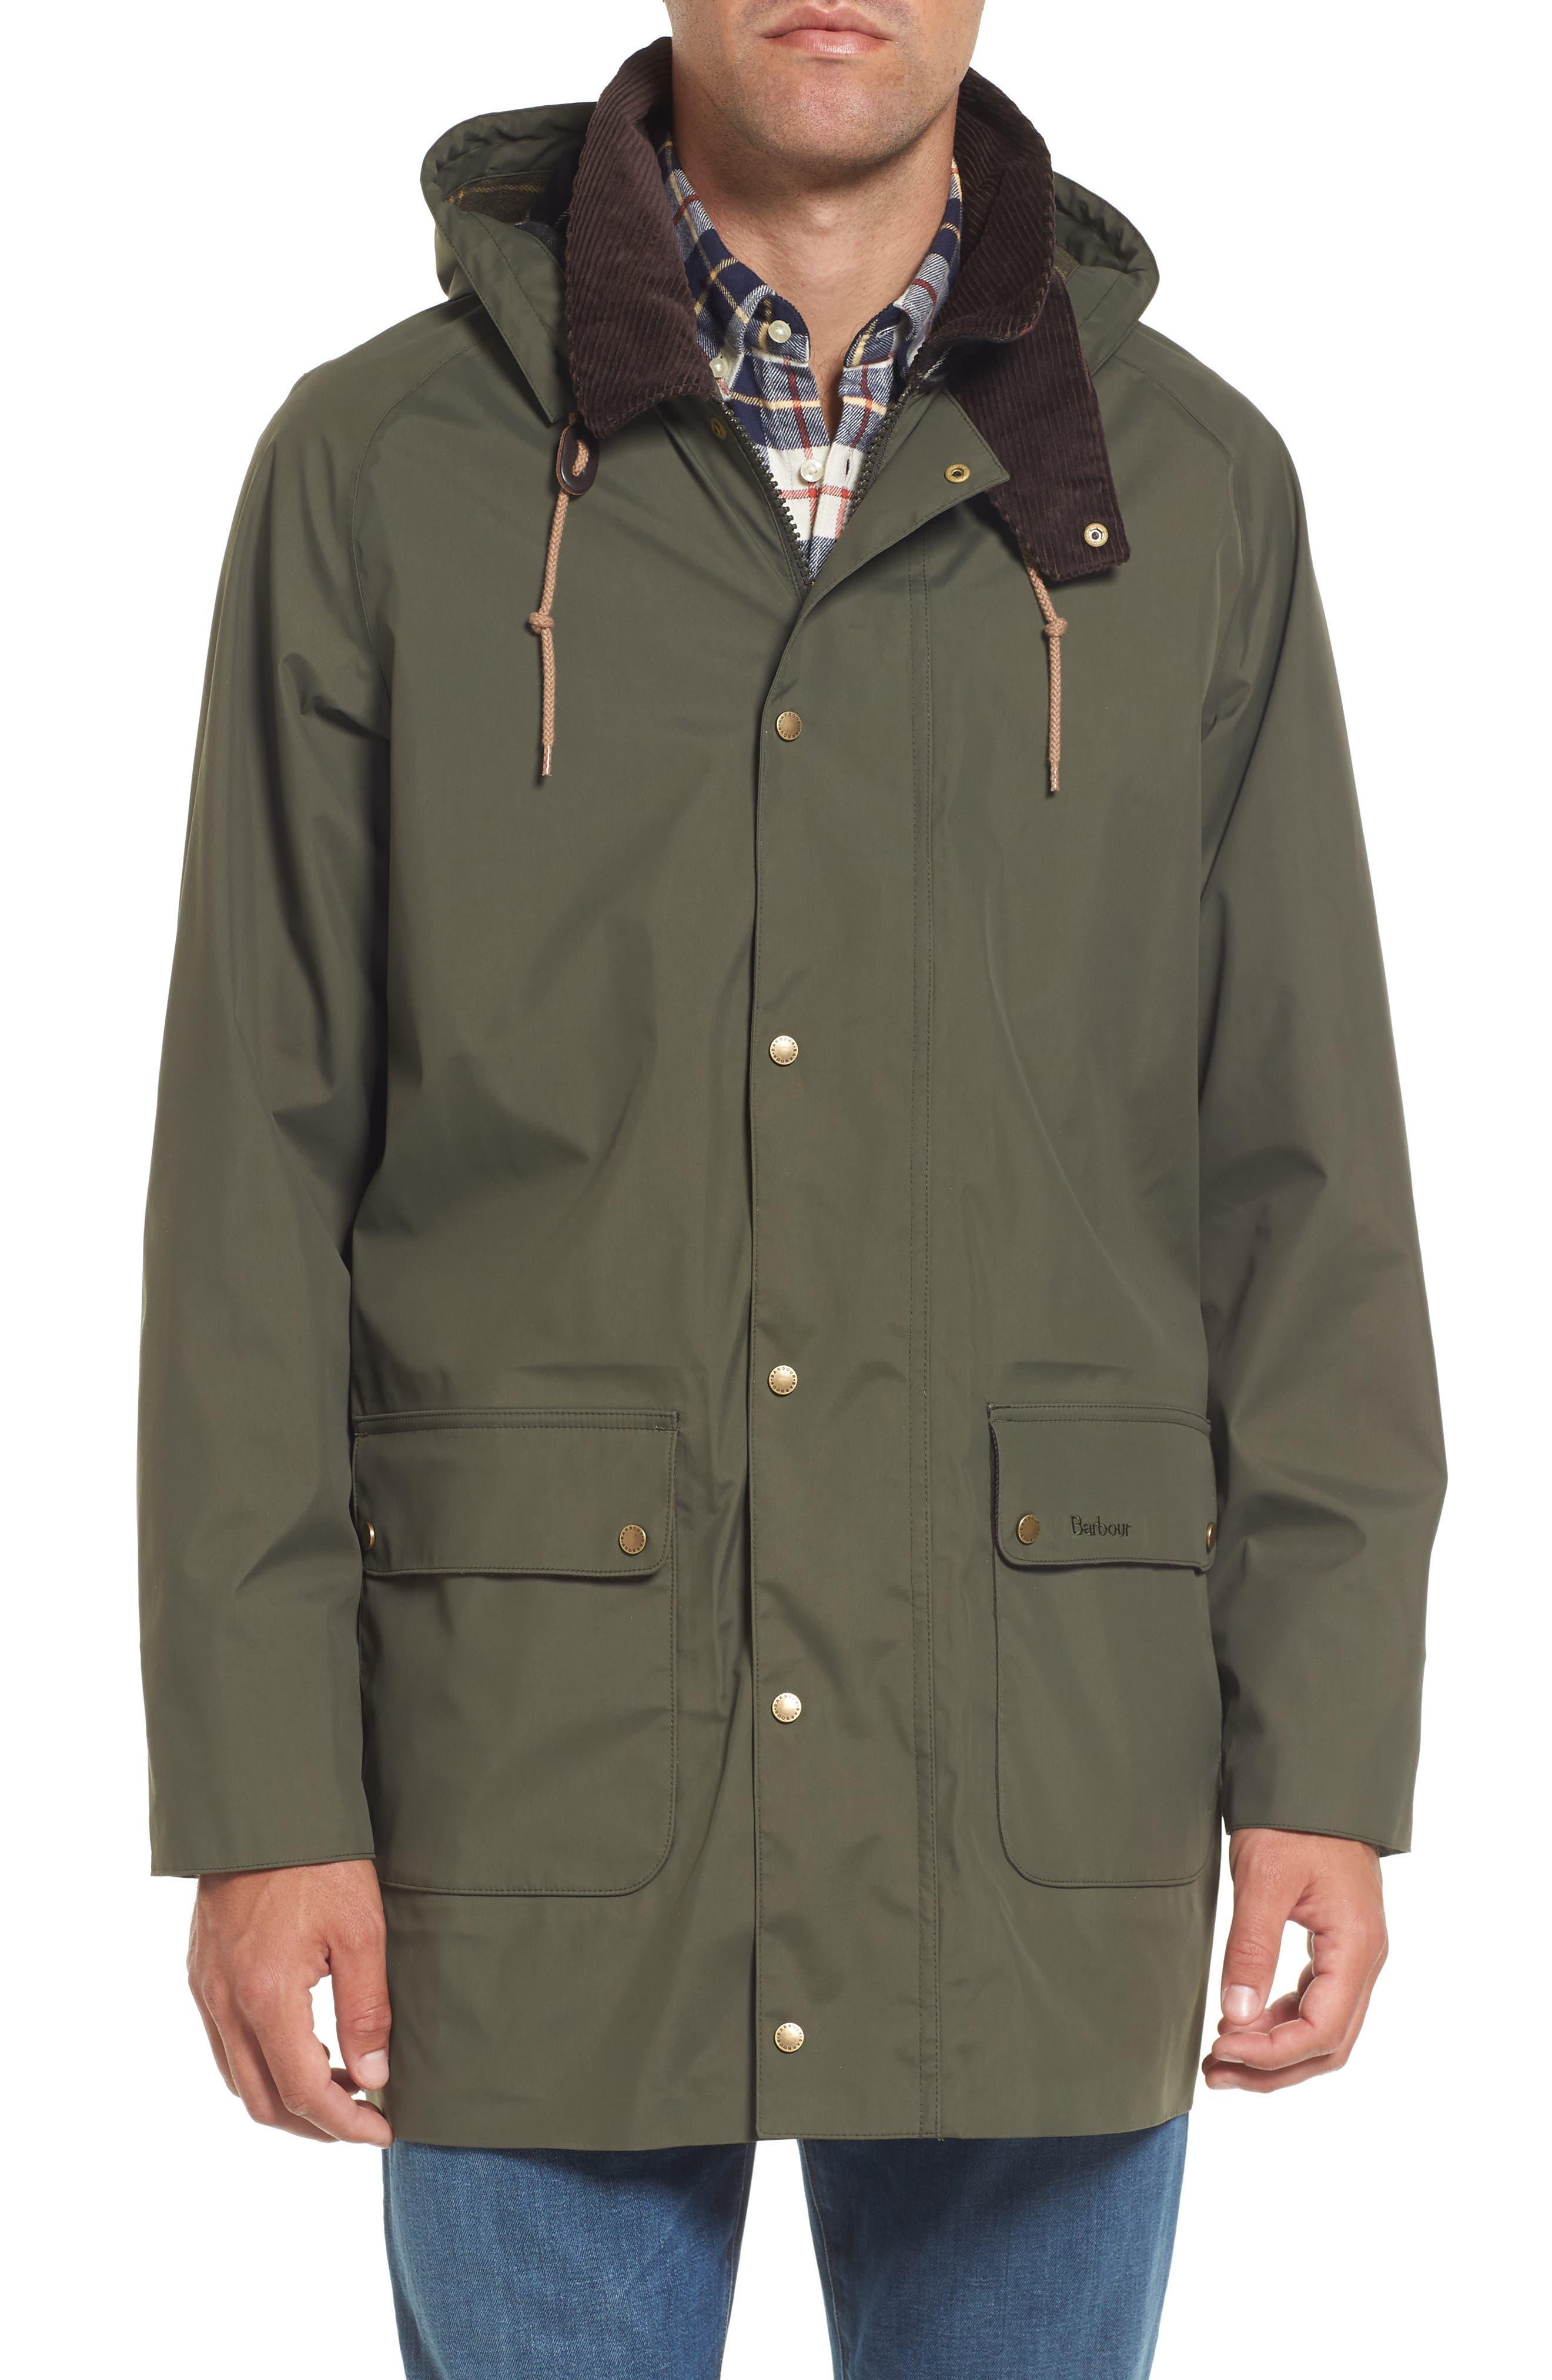 Scarisbrick Waterproof Jacket,                             Main thumbnail 1, color,                             340